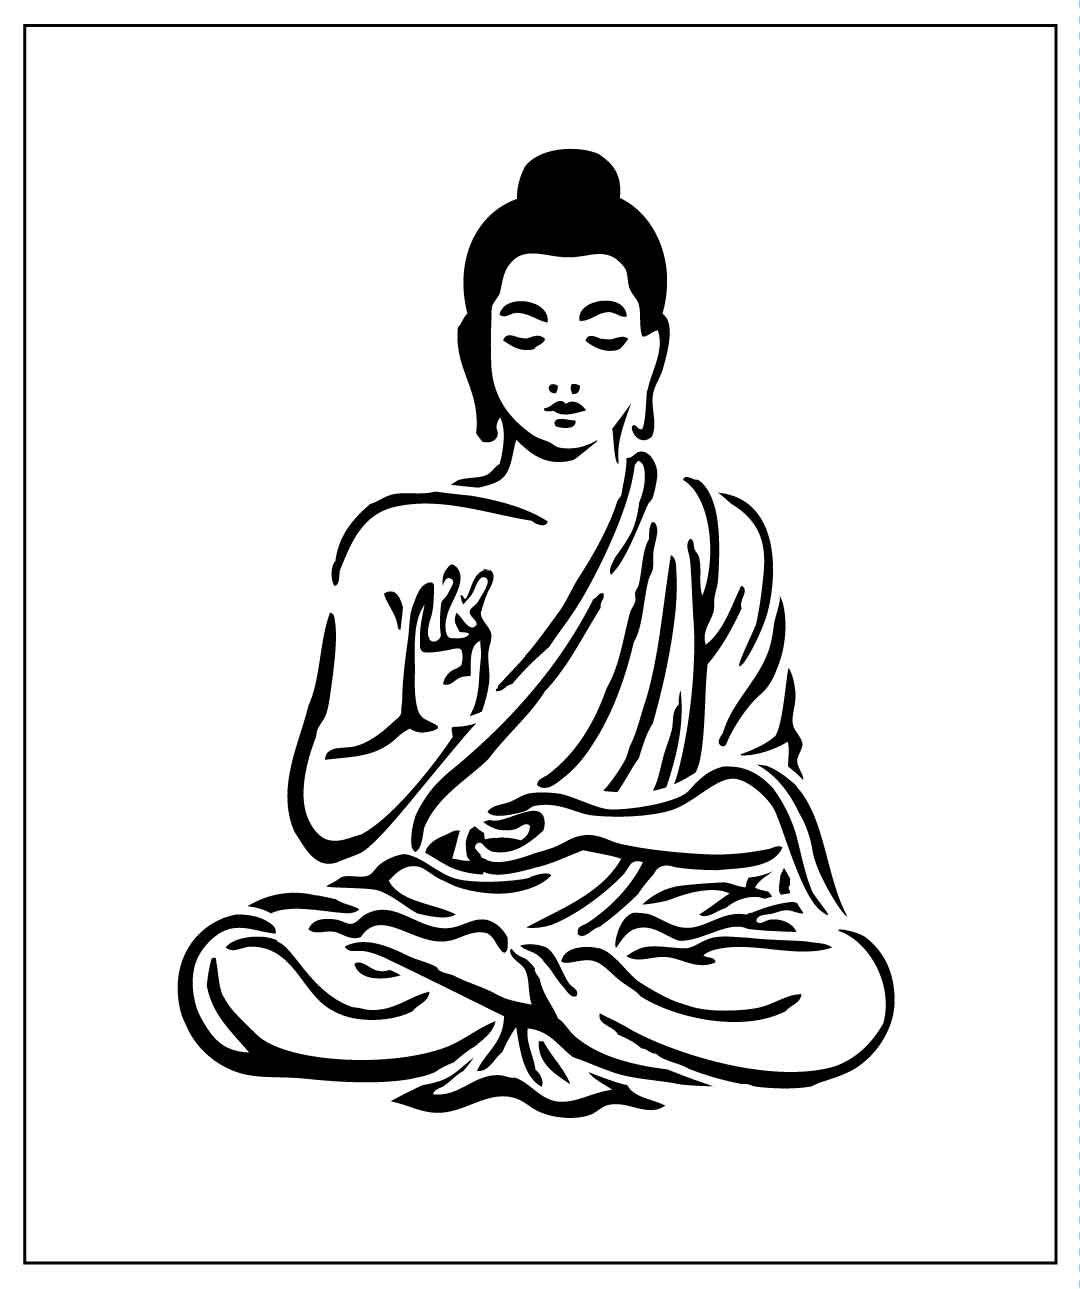 Pochoir Bouddha Gratuit Imprimer Gamboahinestrosa